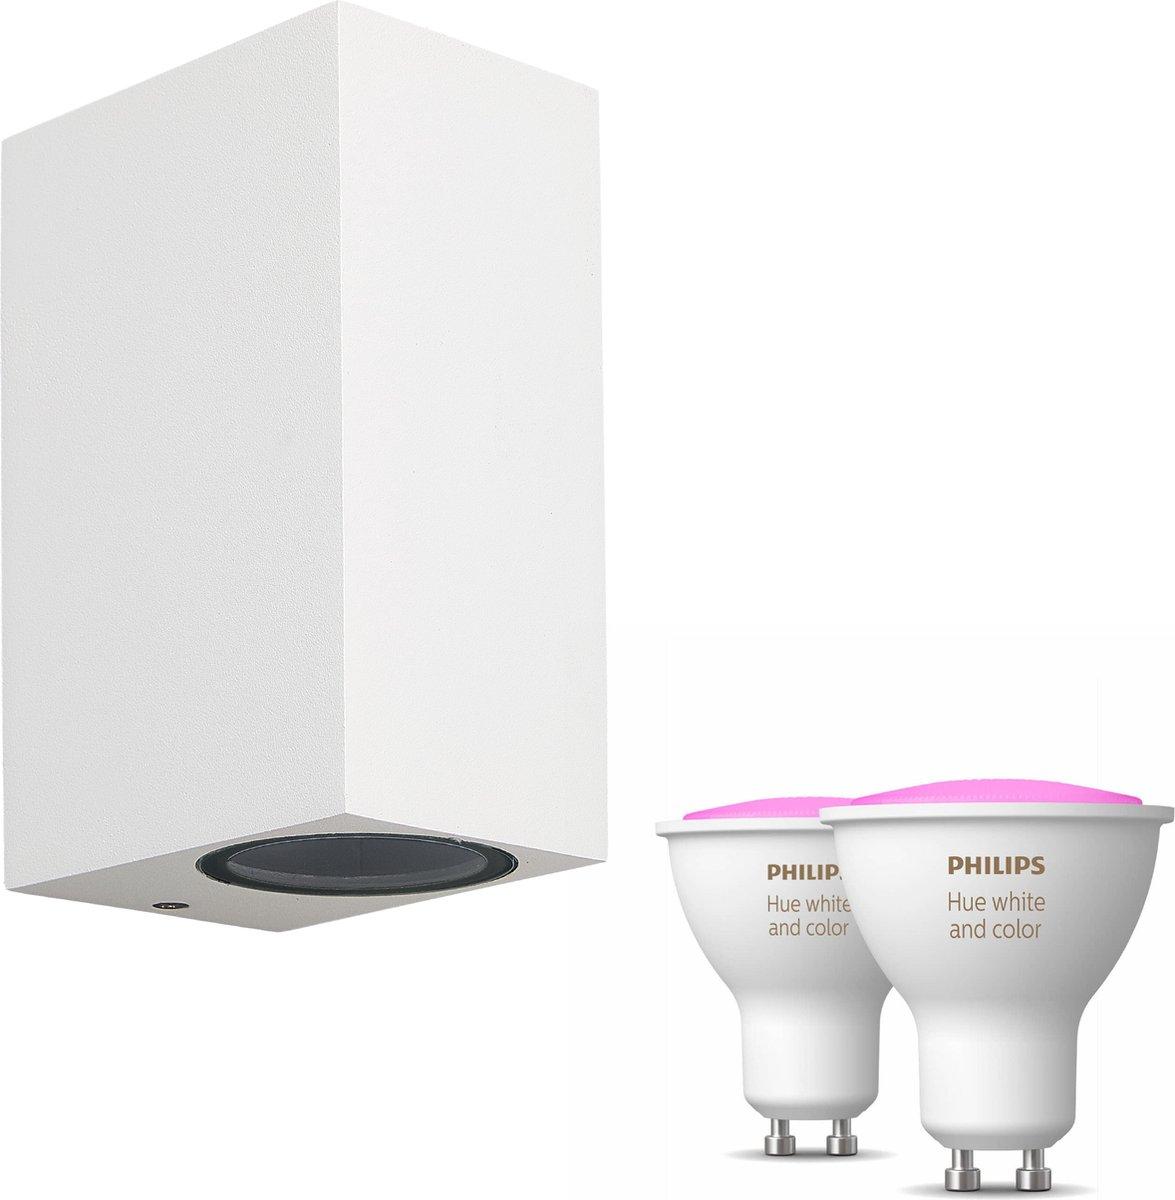 Mantra Kandachu wandlamp rechthoekig - wit - 2 lichtpunten - Incl. Philips Hue White & Color Ambiance Gu10 (geschikt voor buitengebruik)